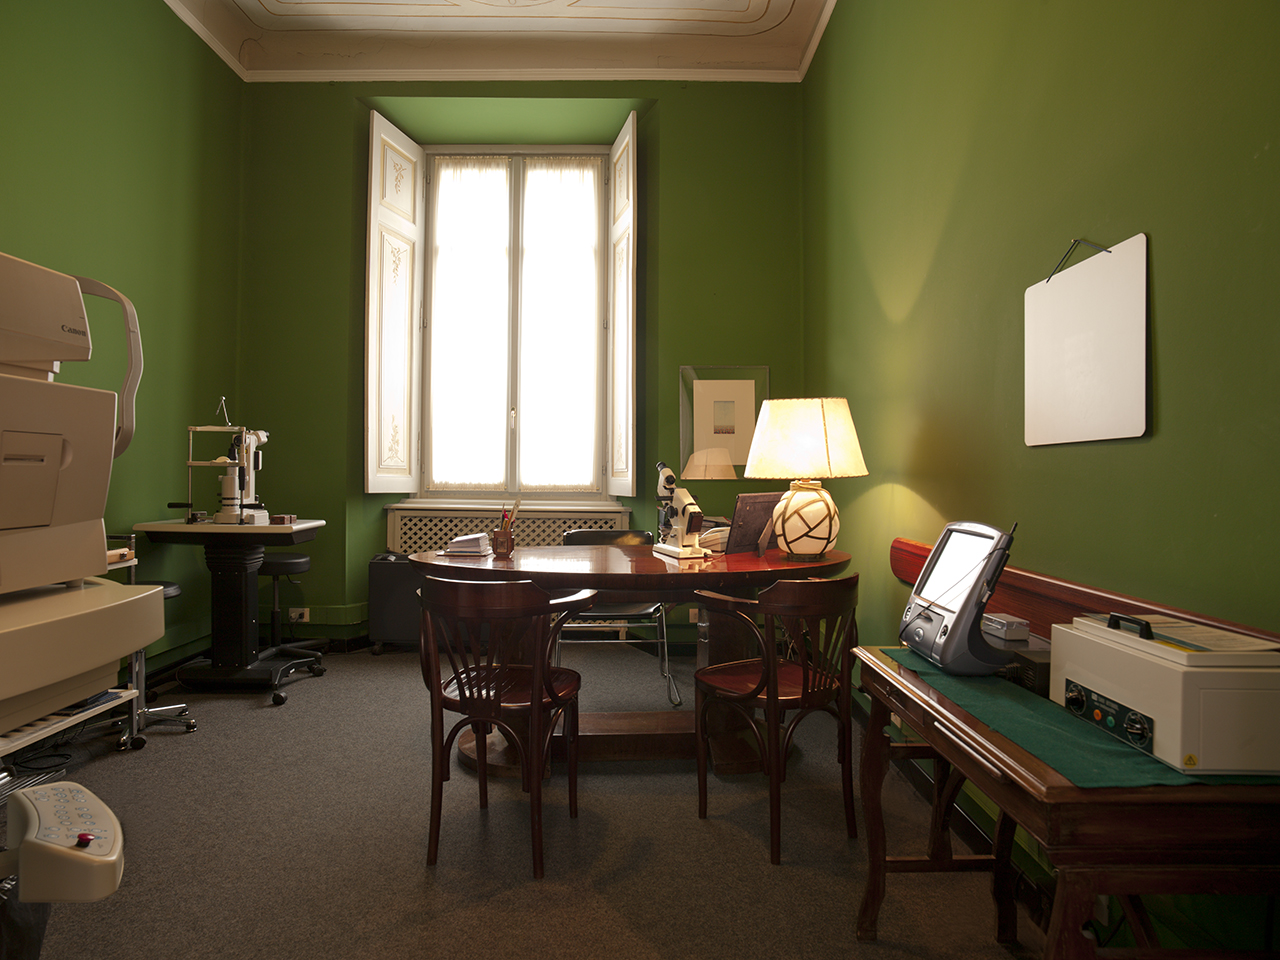 Doctor Studio / Como 7